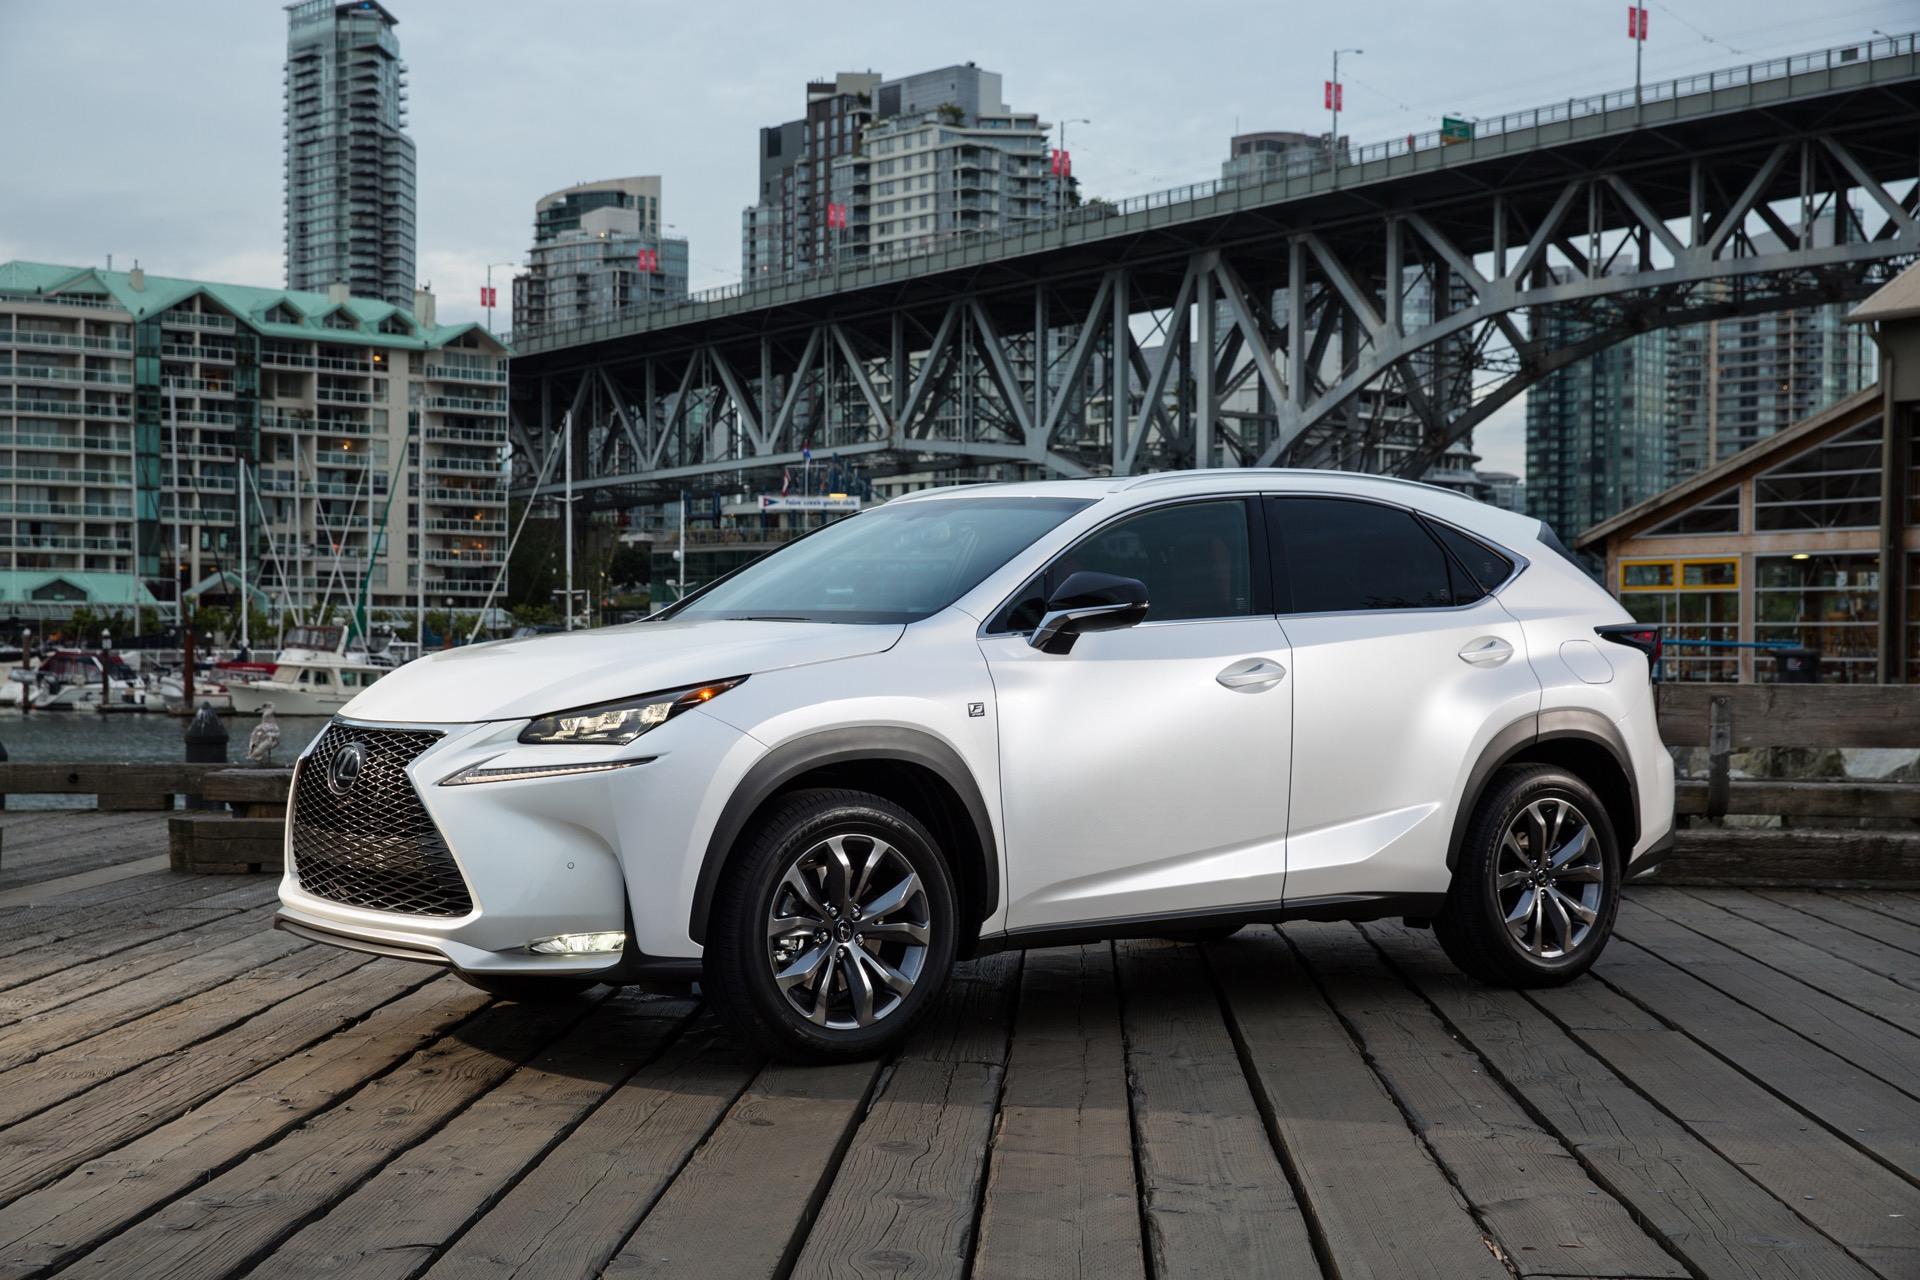 Half of car ers hate haggling but Lexus dealers resist fixed